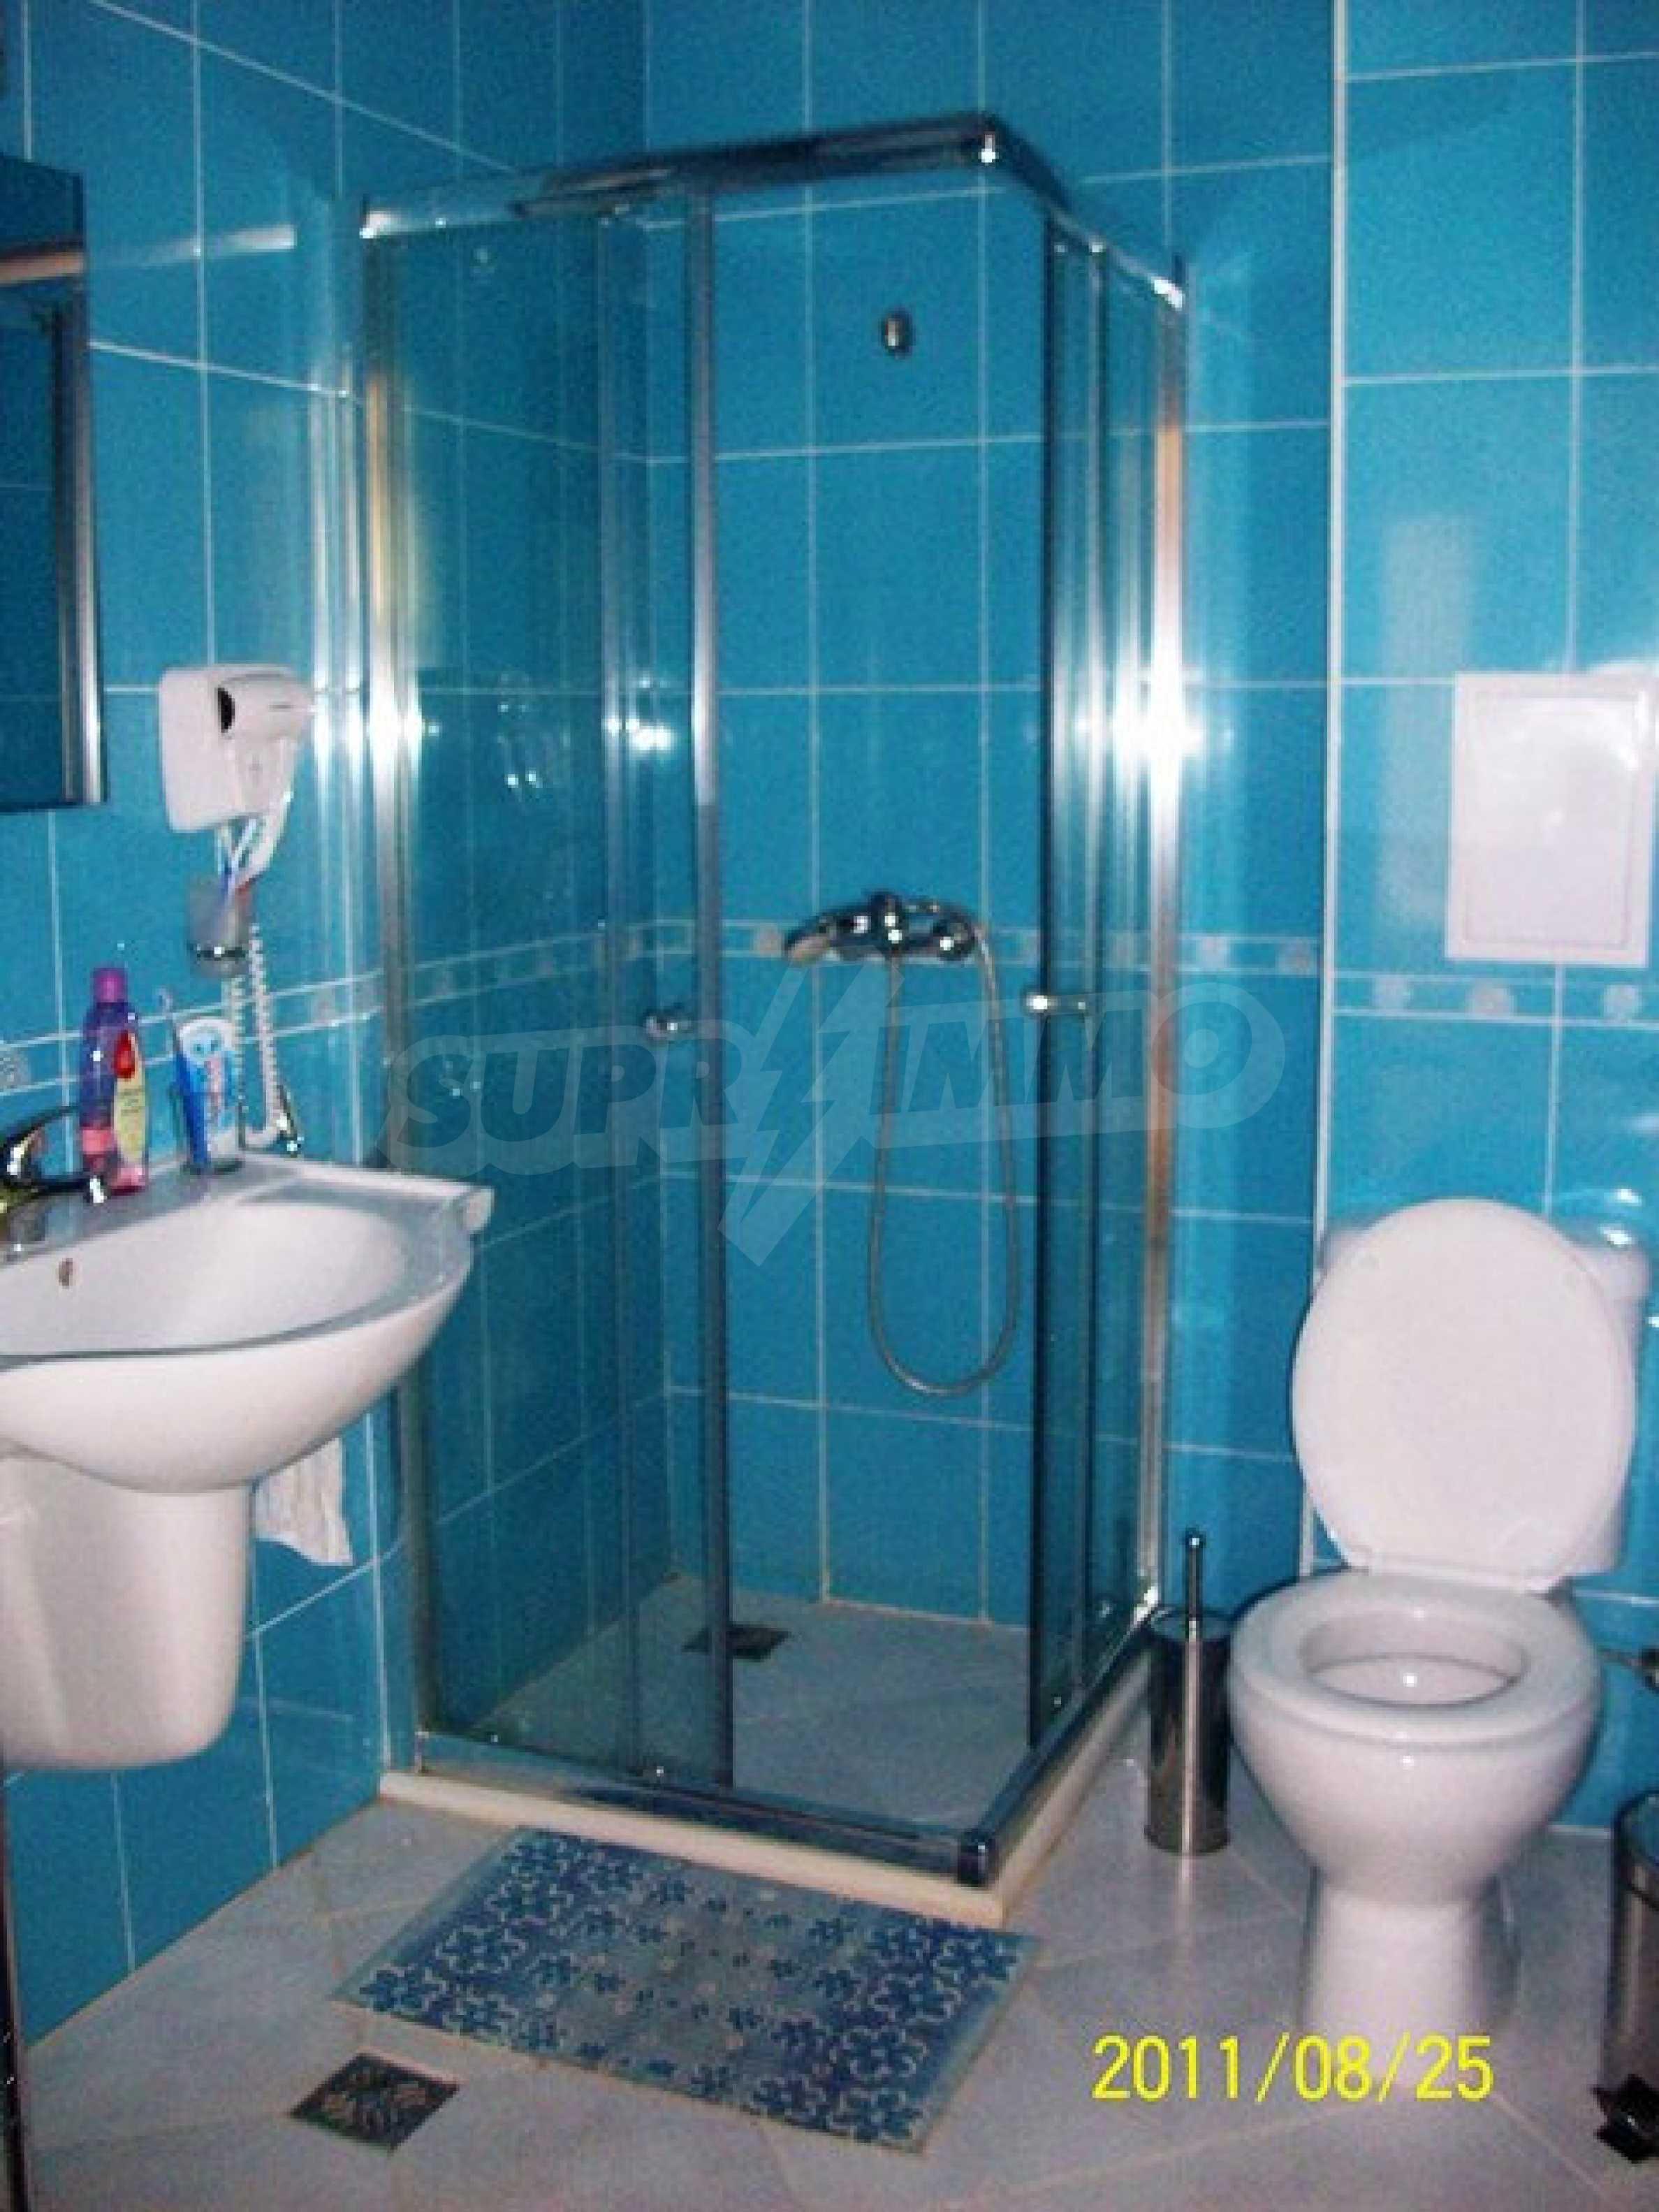 Трехкомнатный апартамент на продажу в комплексе Emberli в курорте Лозенец 22